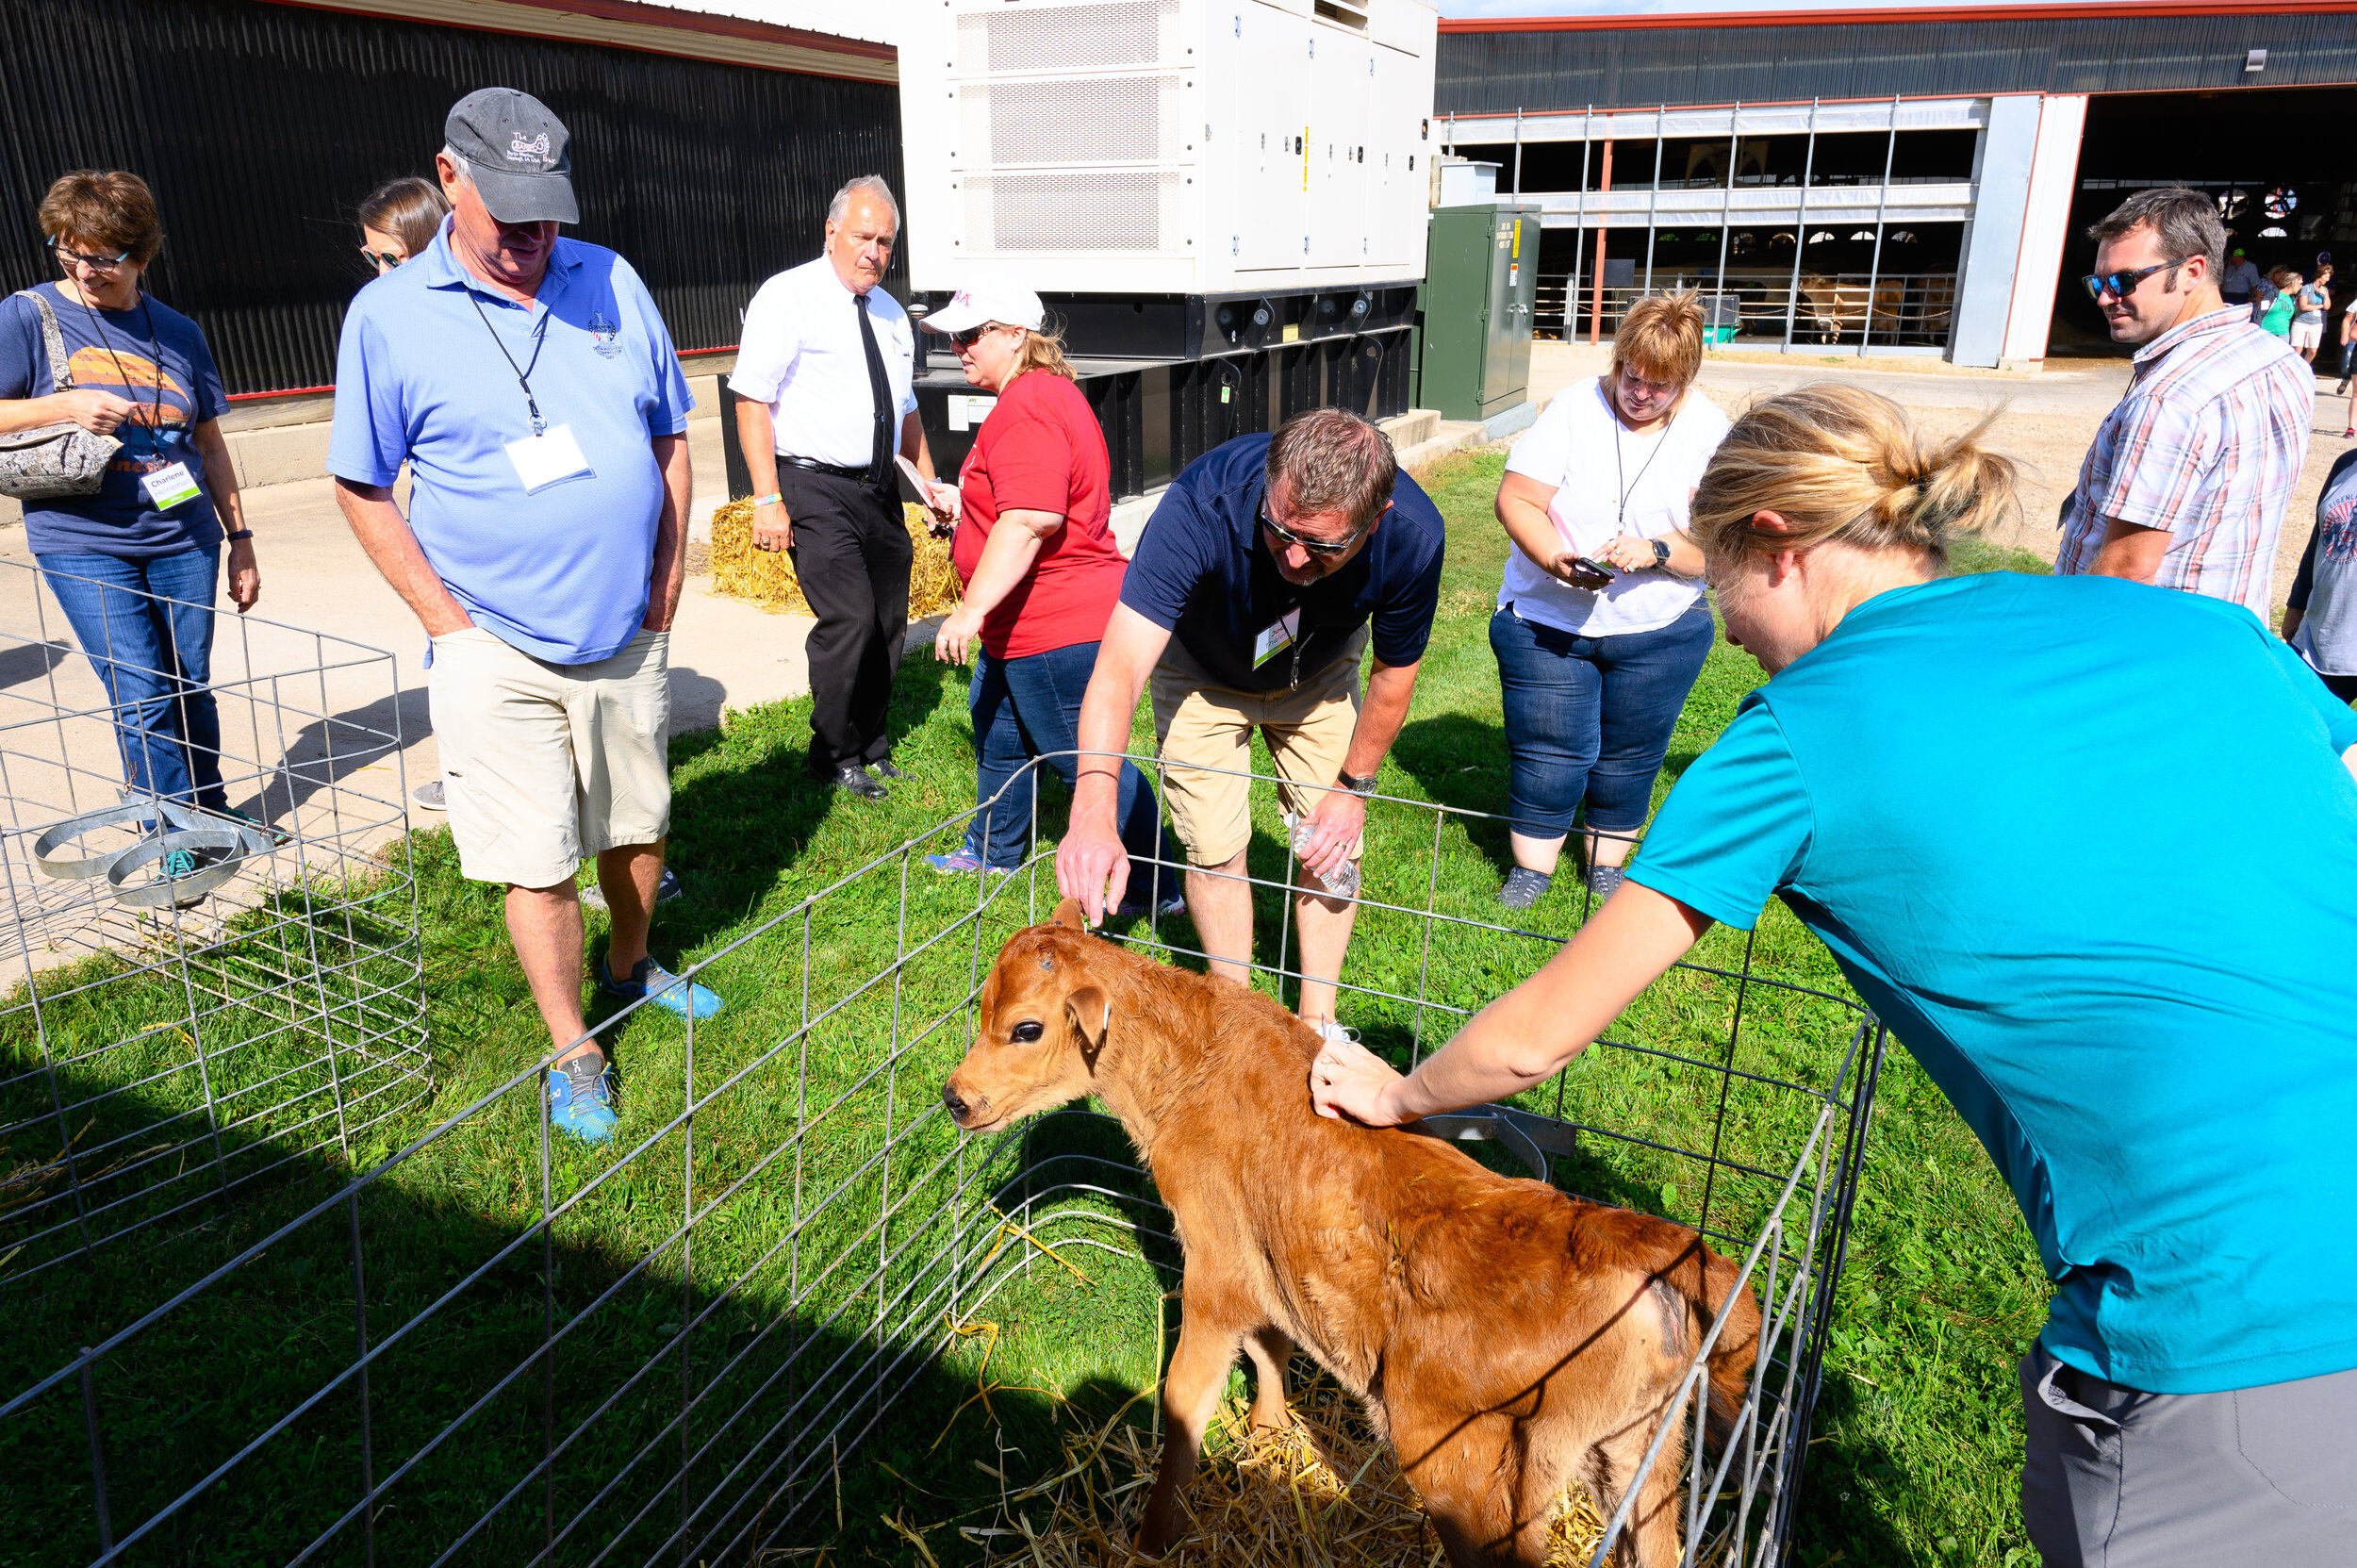 Newborn calves are bottle-fed to ensure proper nutrition. Photo credit: Joseph L. Murphy/Iowa Soybean Association